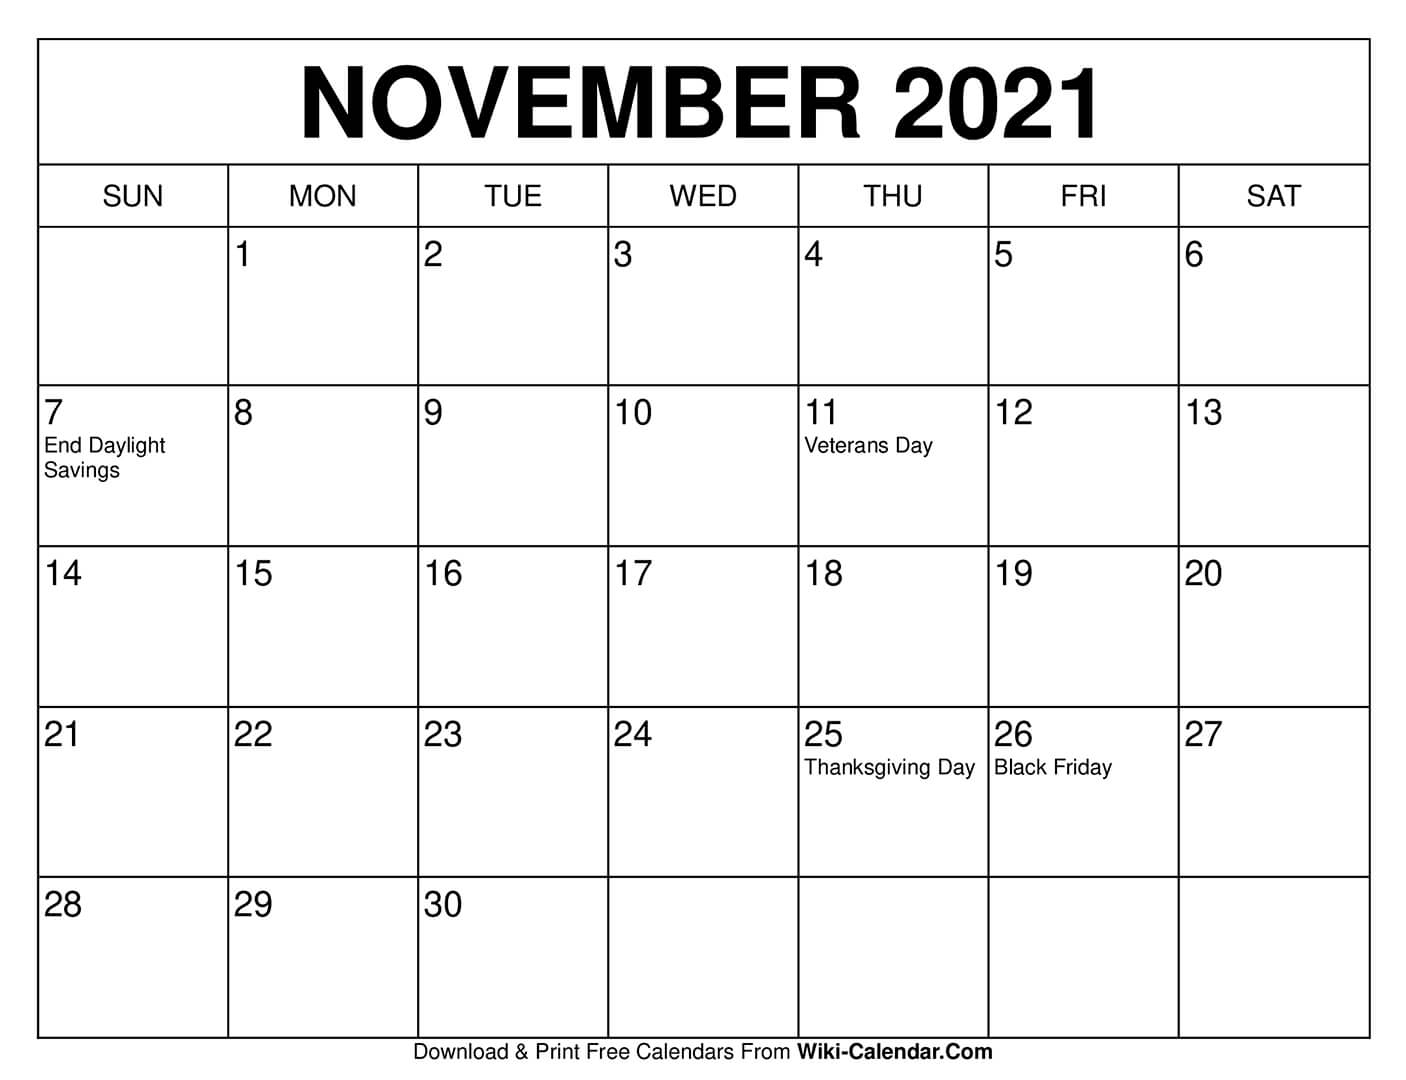 Catch Free Printable Blank Calendar November 2021